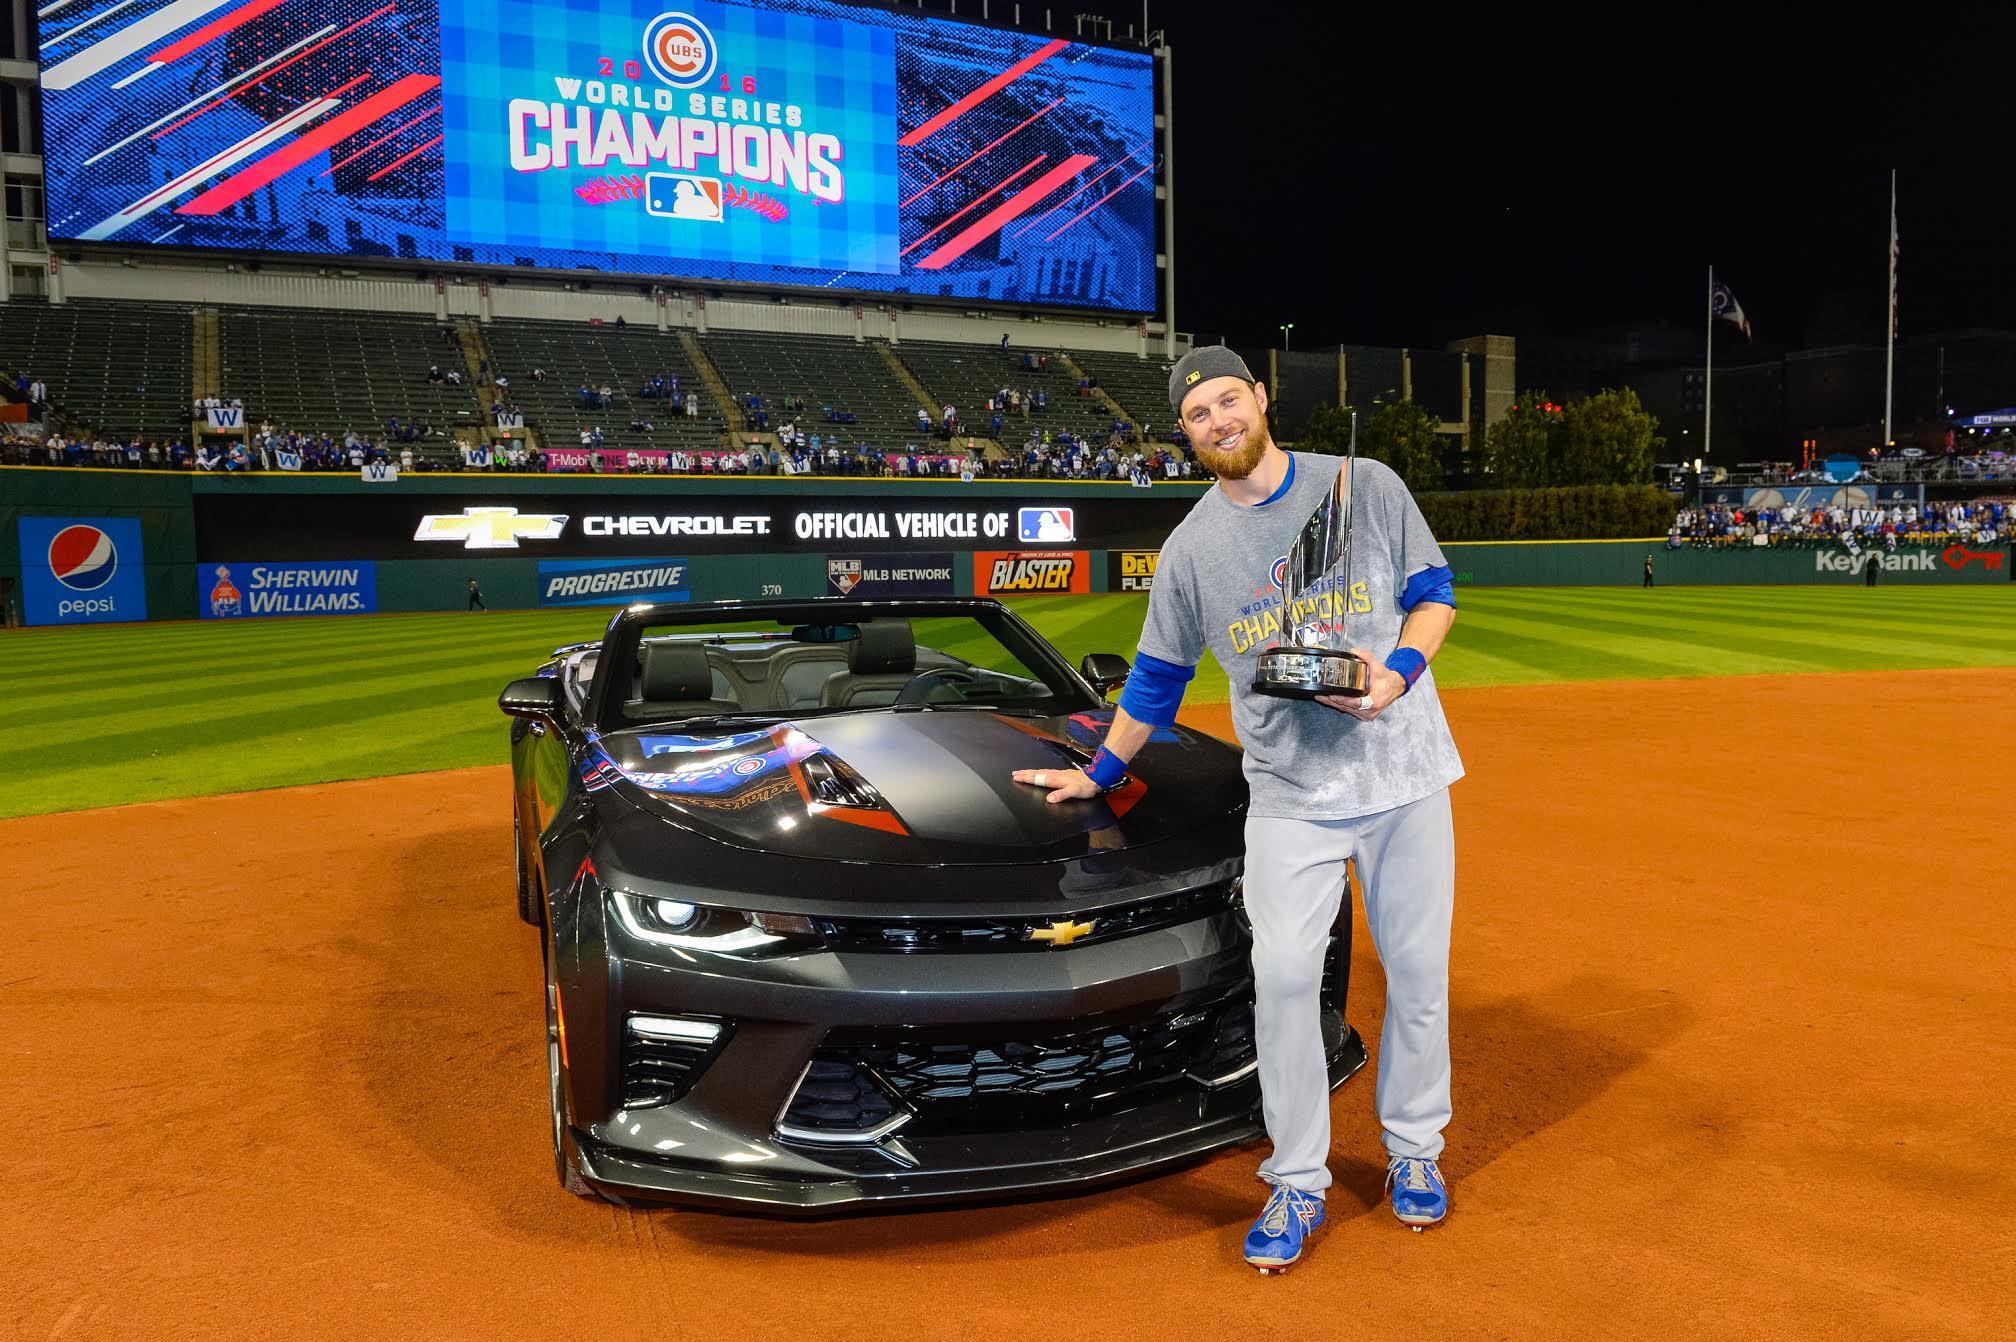 World Series MVP Ben Zobrist gets keys to a new Chevy ...